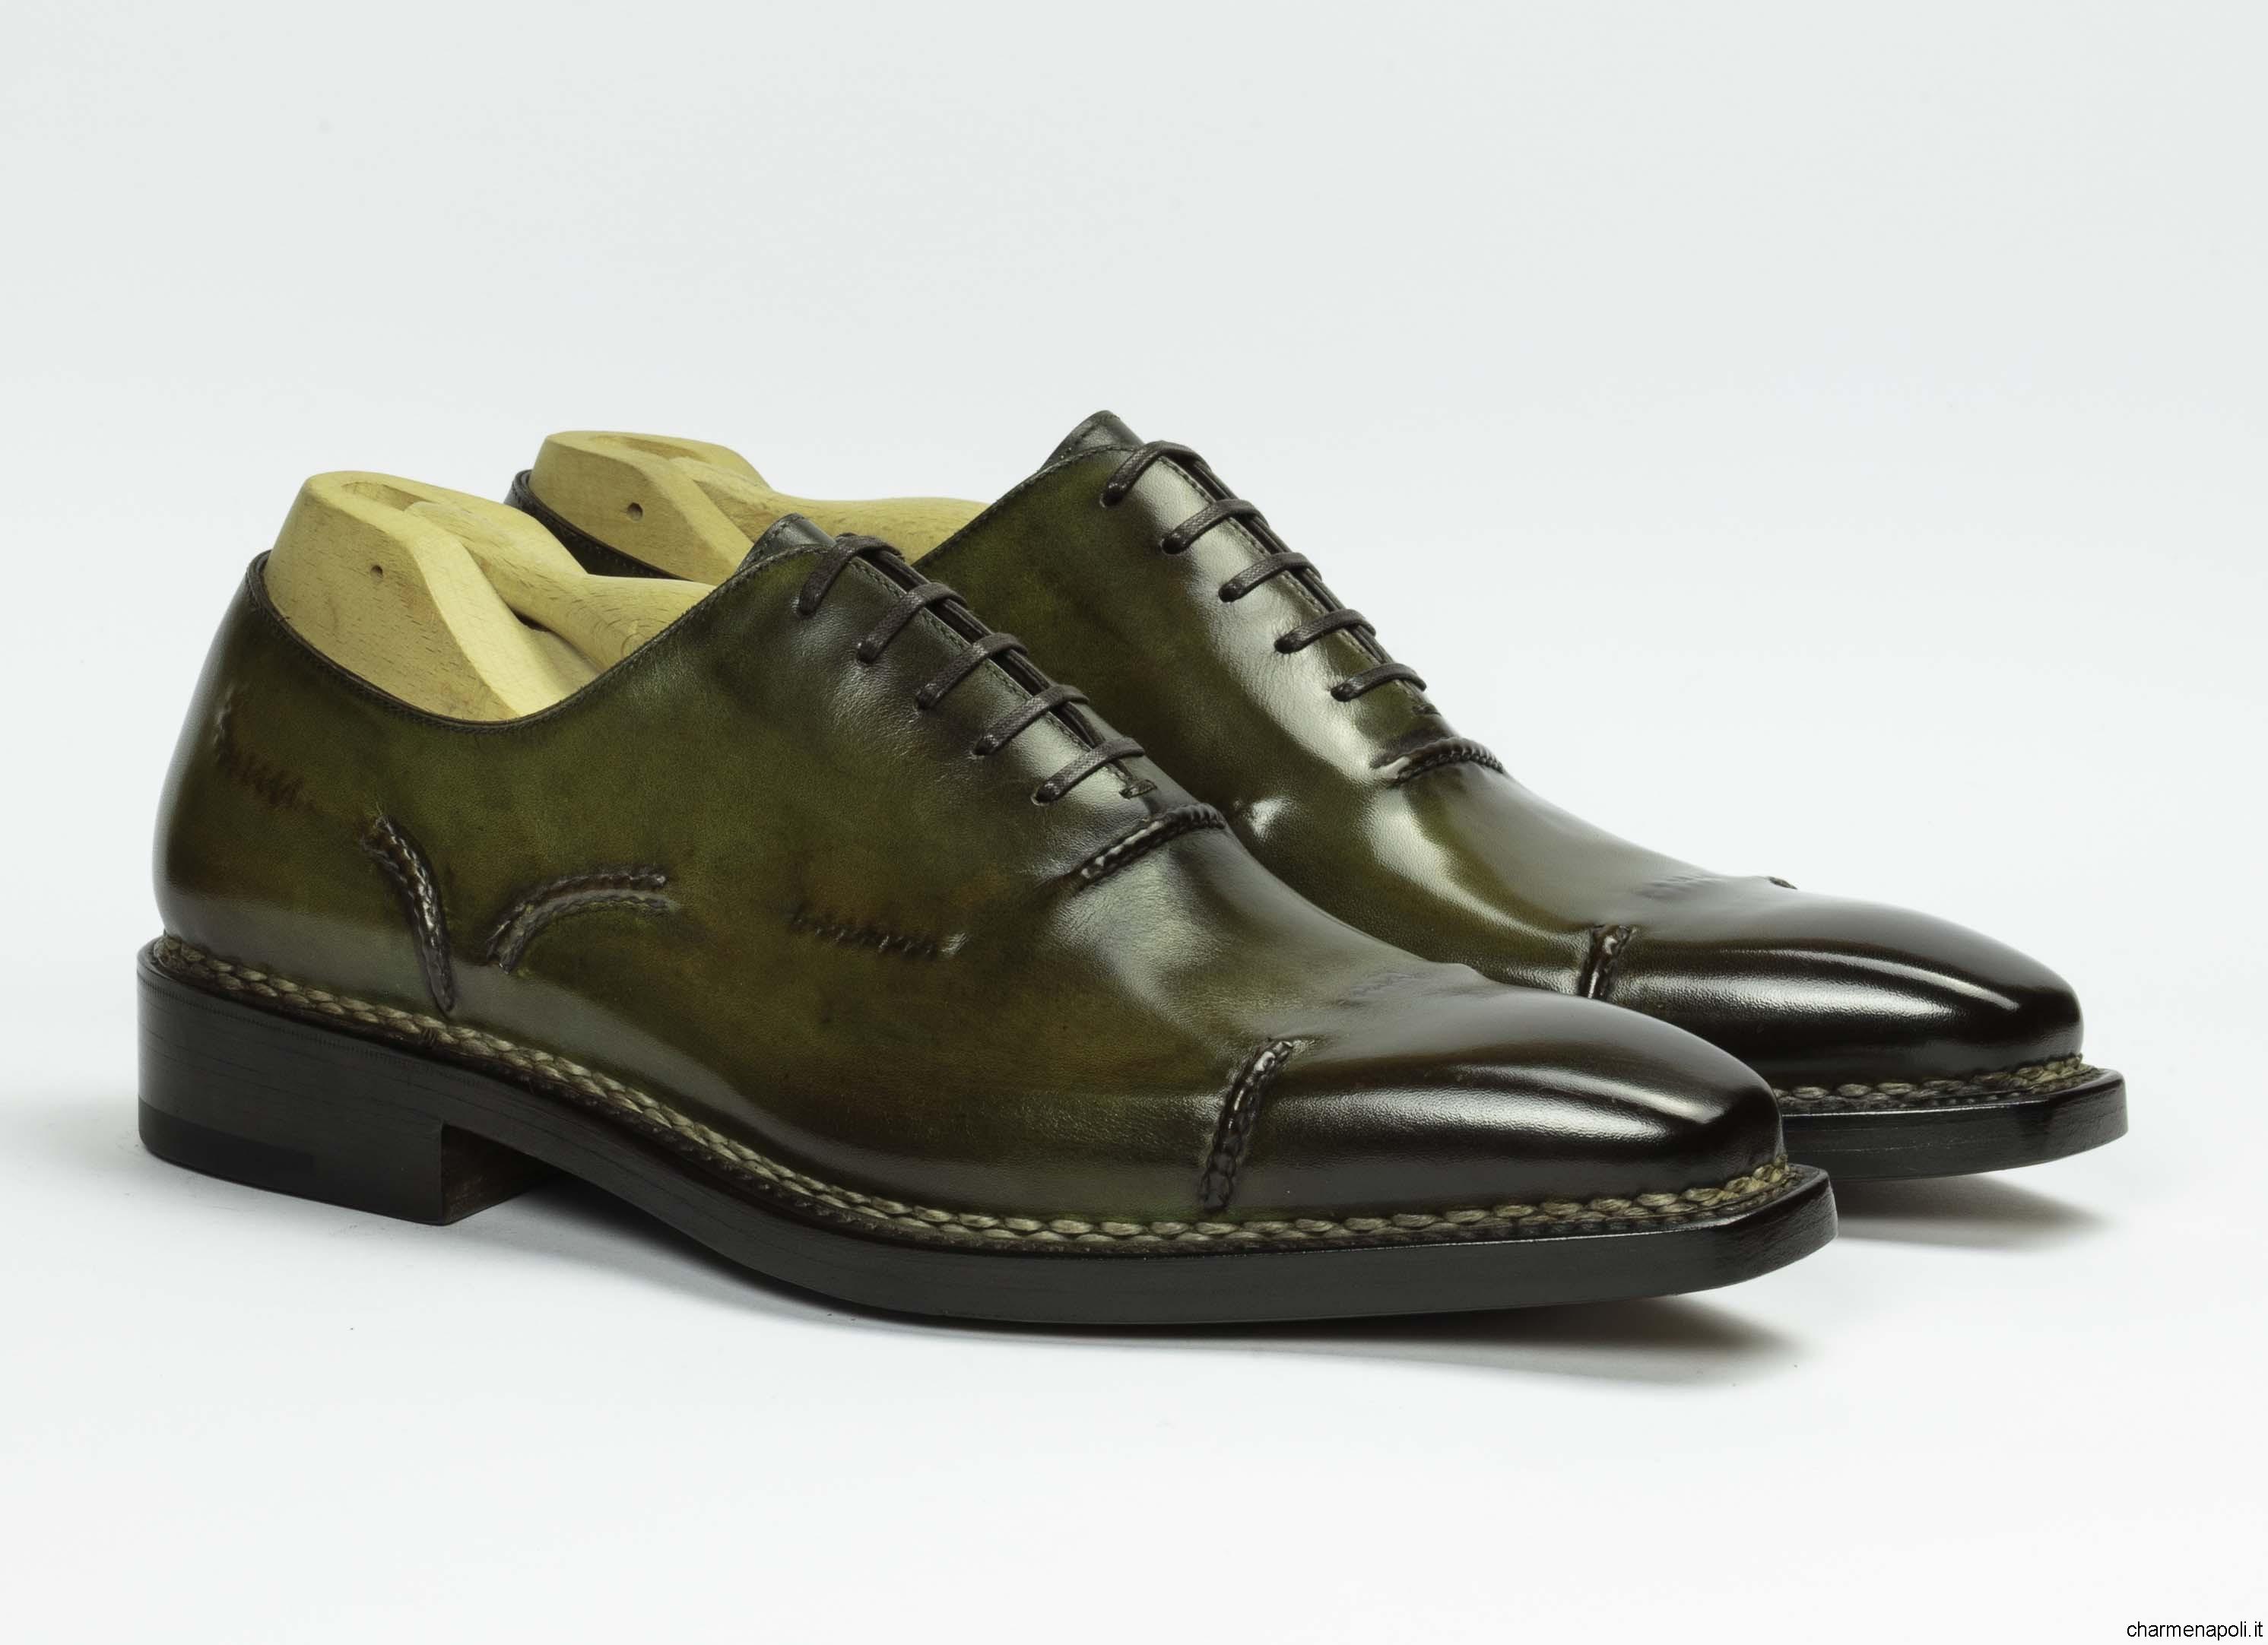 scarpe fatte a mano paolo scafora italian hand made shoes